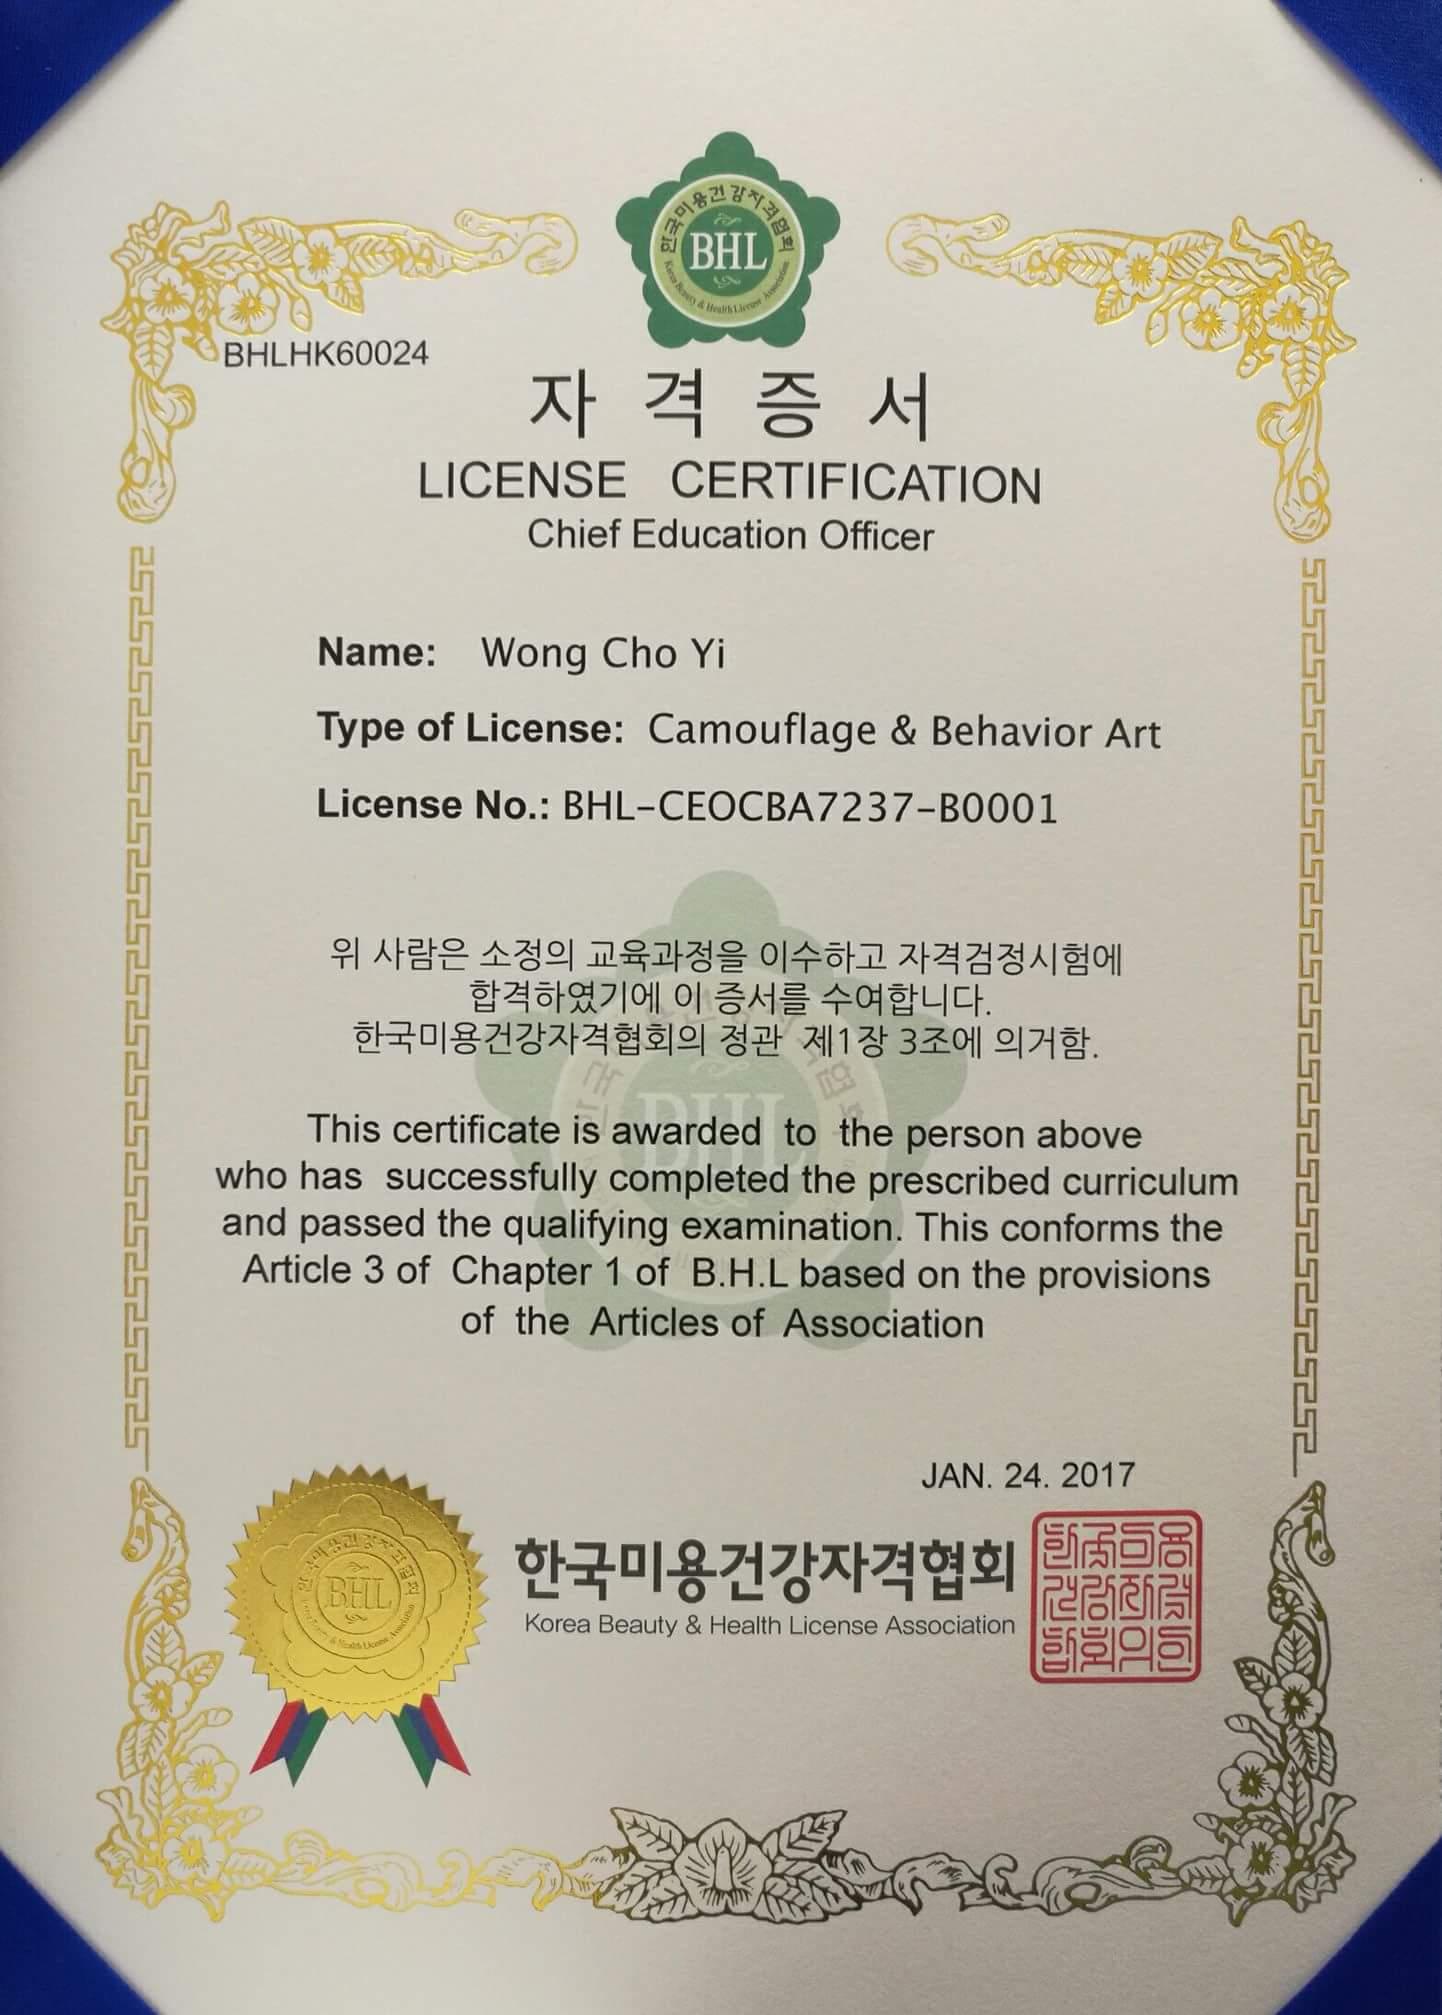 Korea IHOOC BHL IBHGU KOREA Beauty & Health License Association License Certification Chief Education Officer Camouflage & Behavior Art